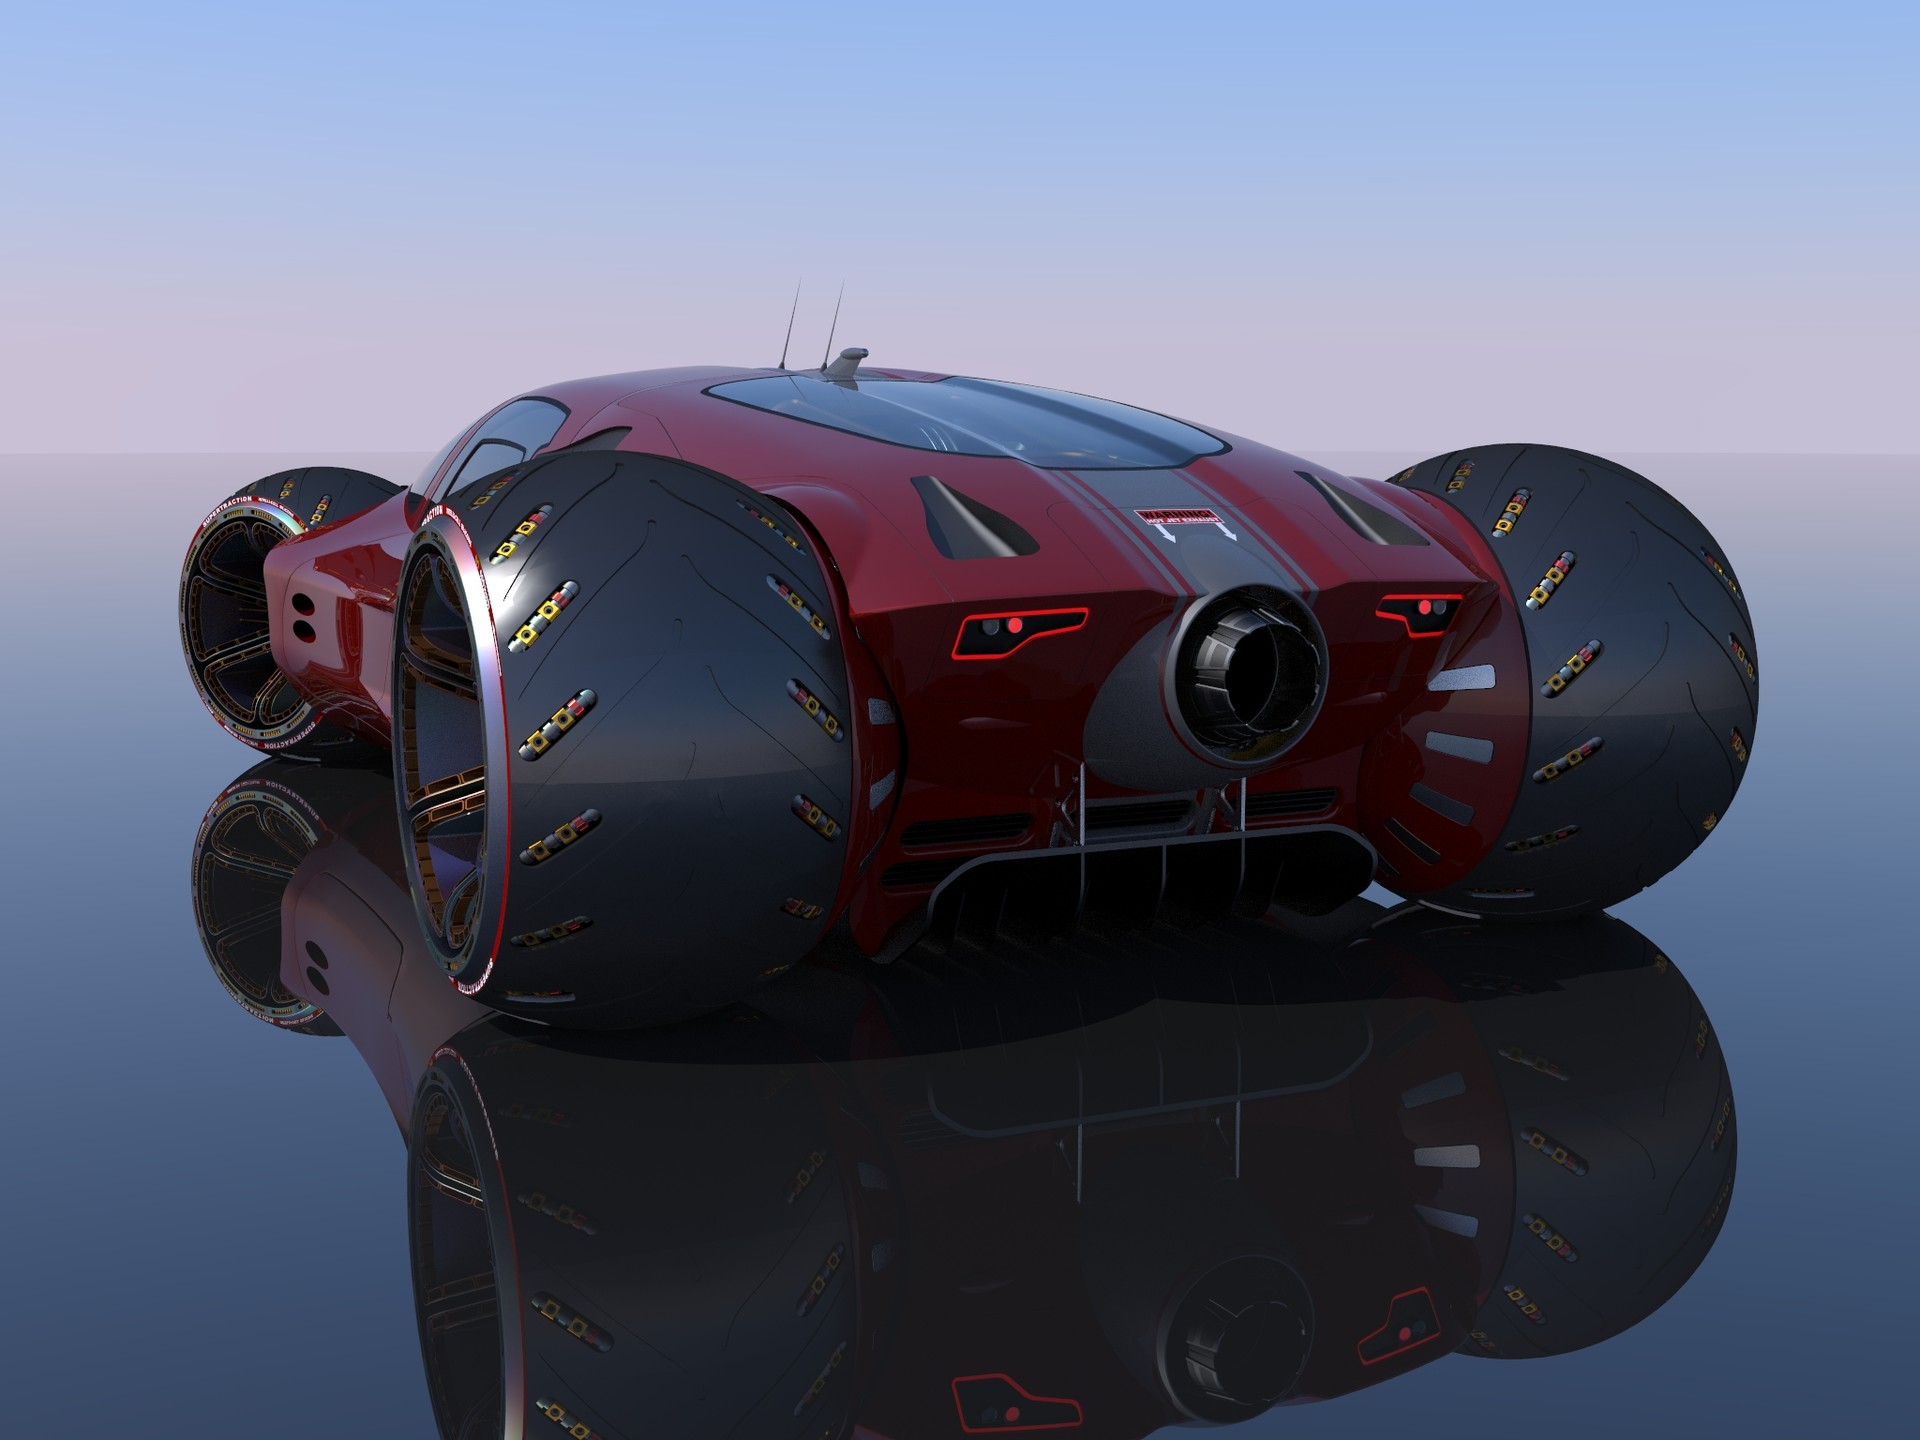 Joachim sverd supercar concept38